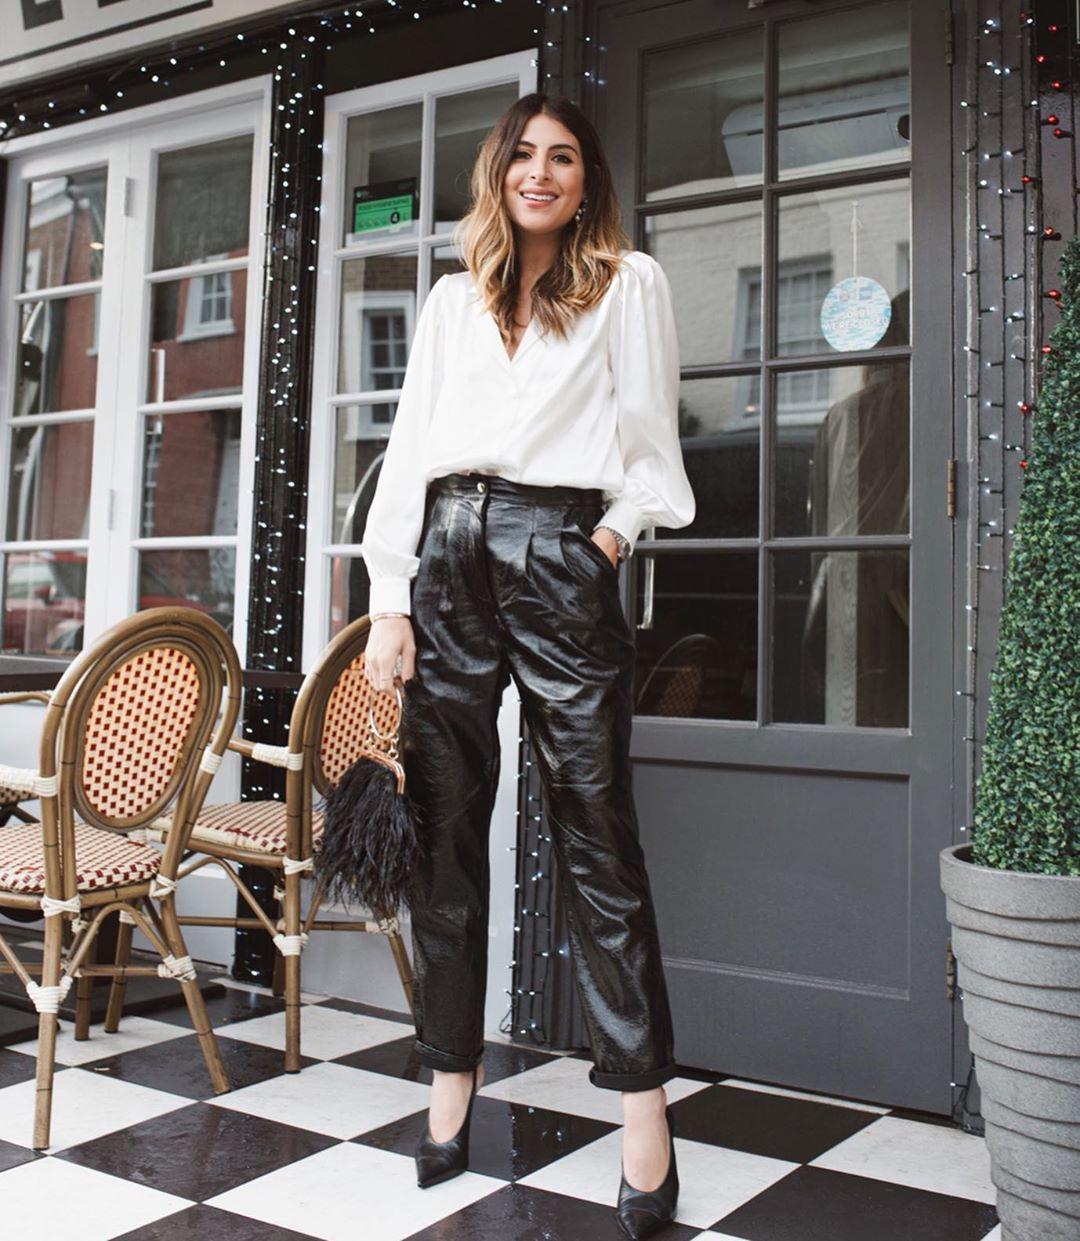 top white shirt high waisted pants black leather pants pumps bag pants straight pants